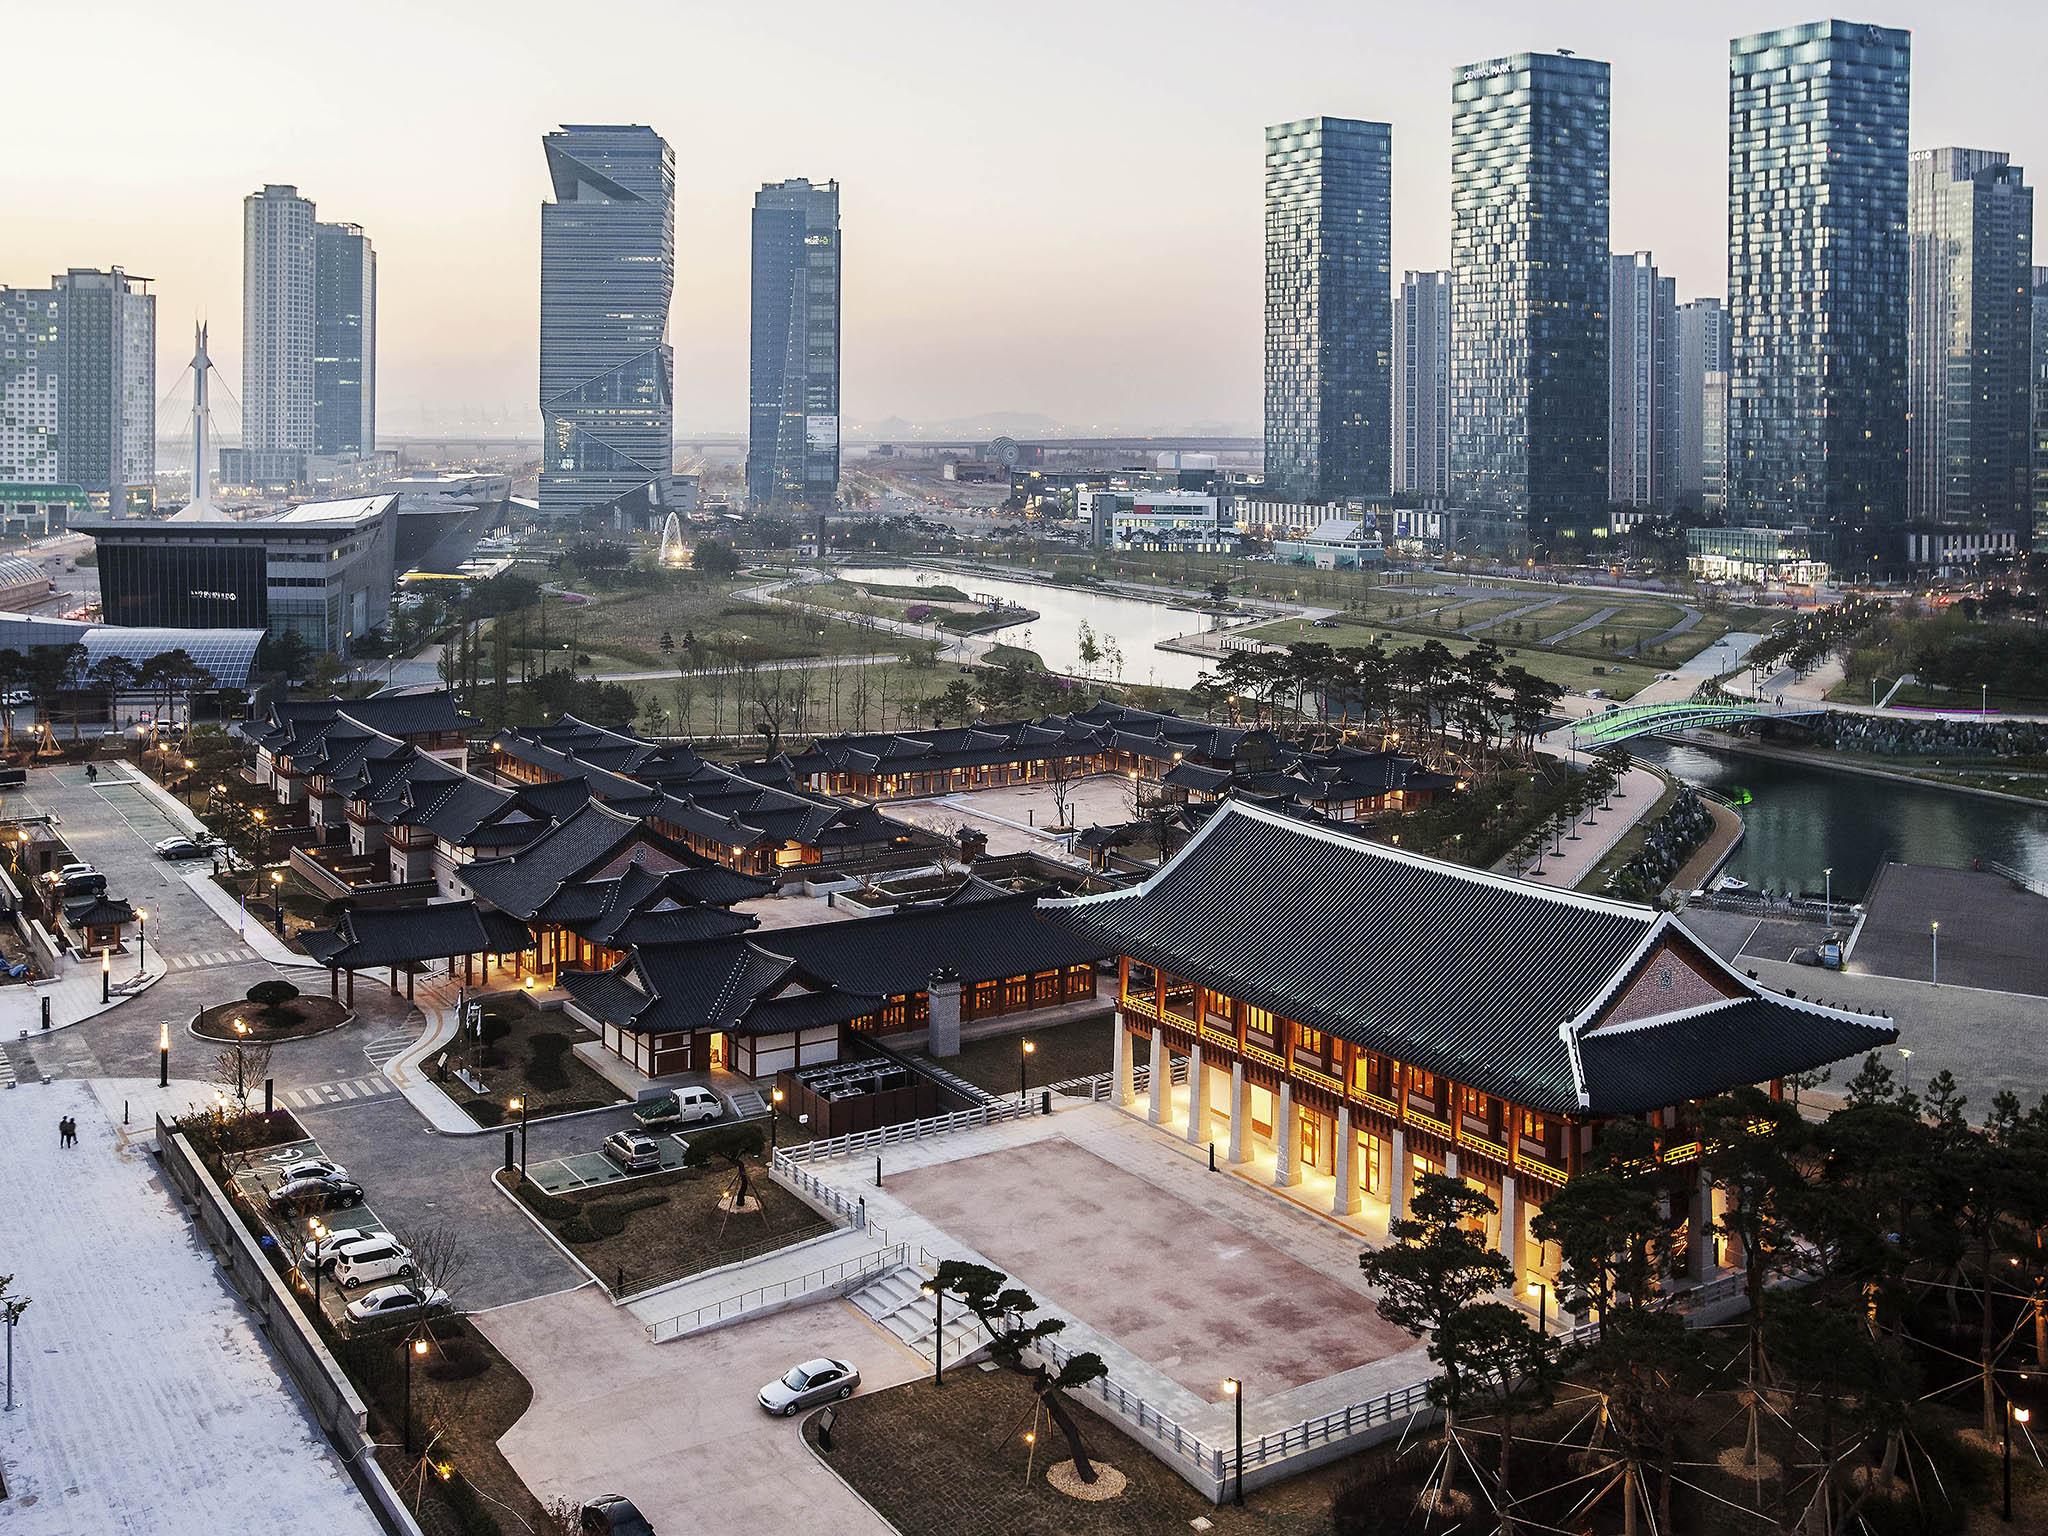 Hotel – Gyeongwonjae Ambassador Incheon - Hotel asociado a AccorHotels